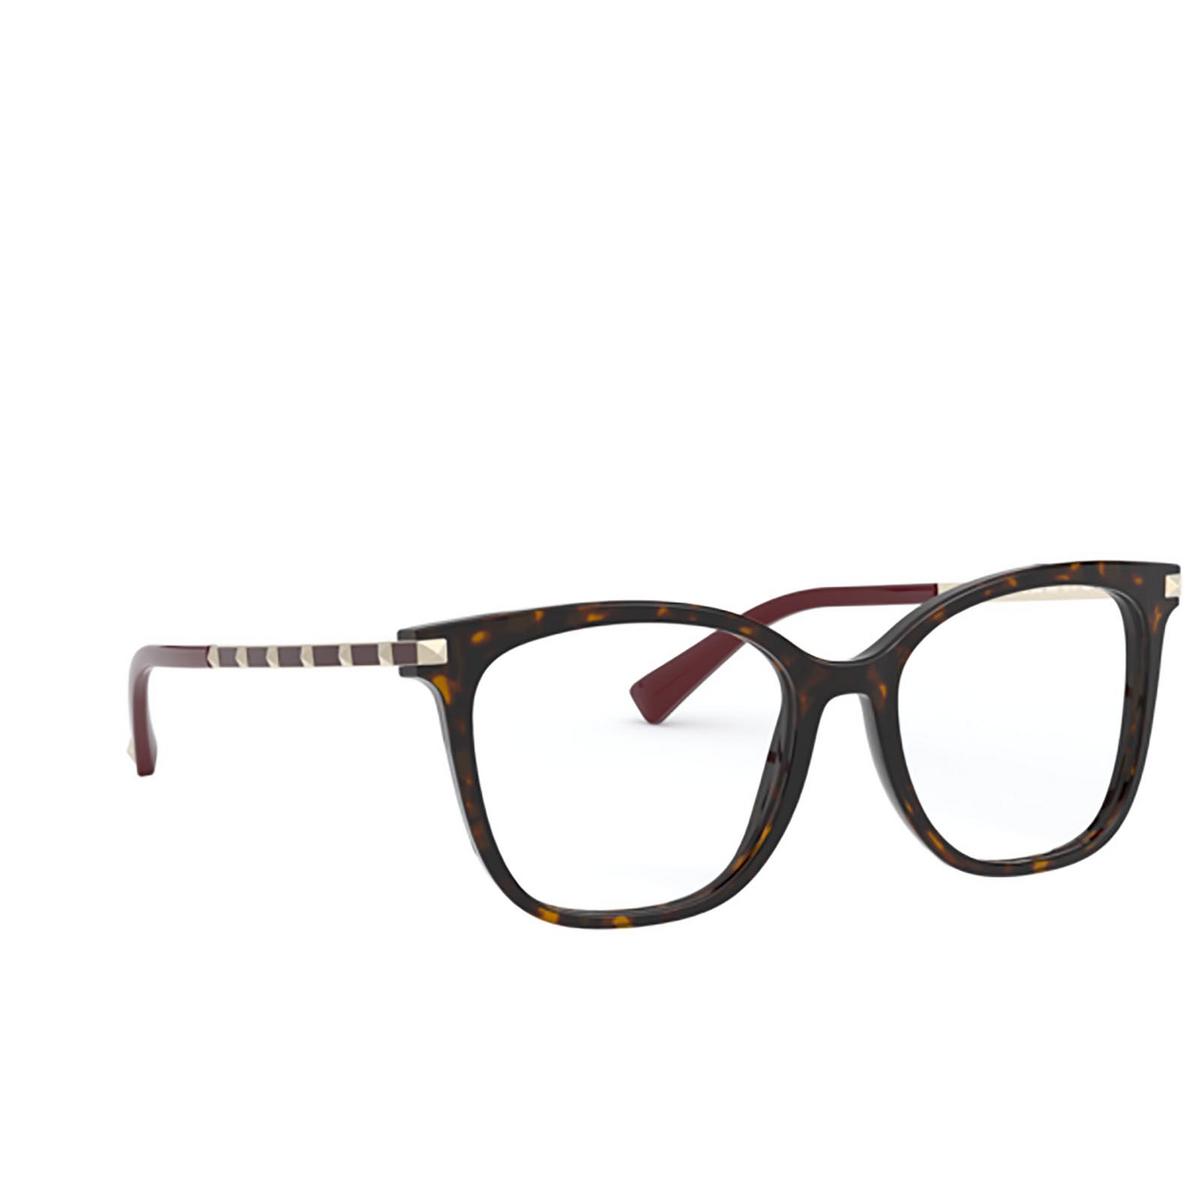 Valentino® Square Eyeglasses: VA3048 color Havana 5002 - three-quarters view.